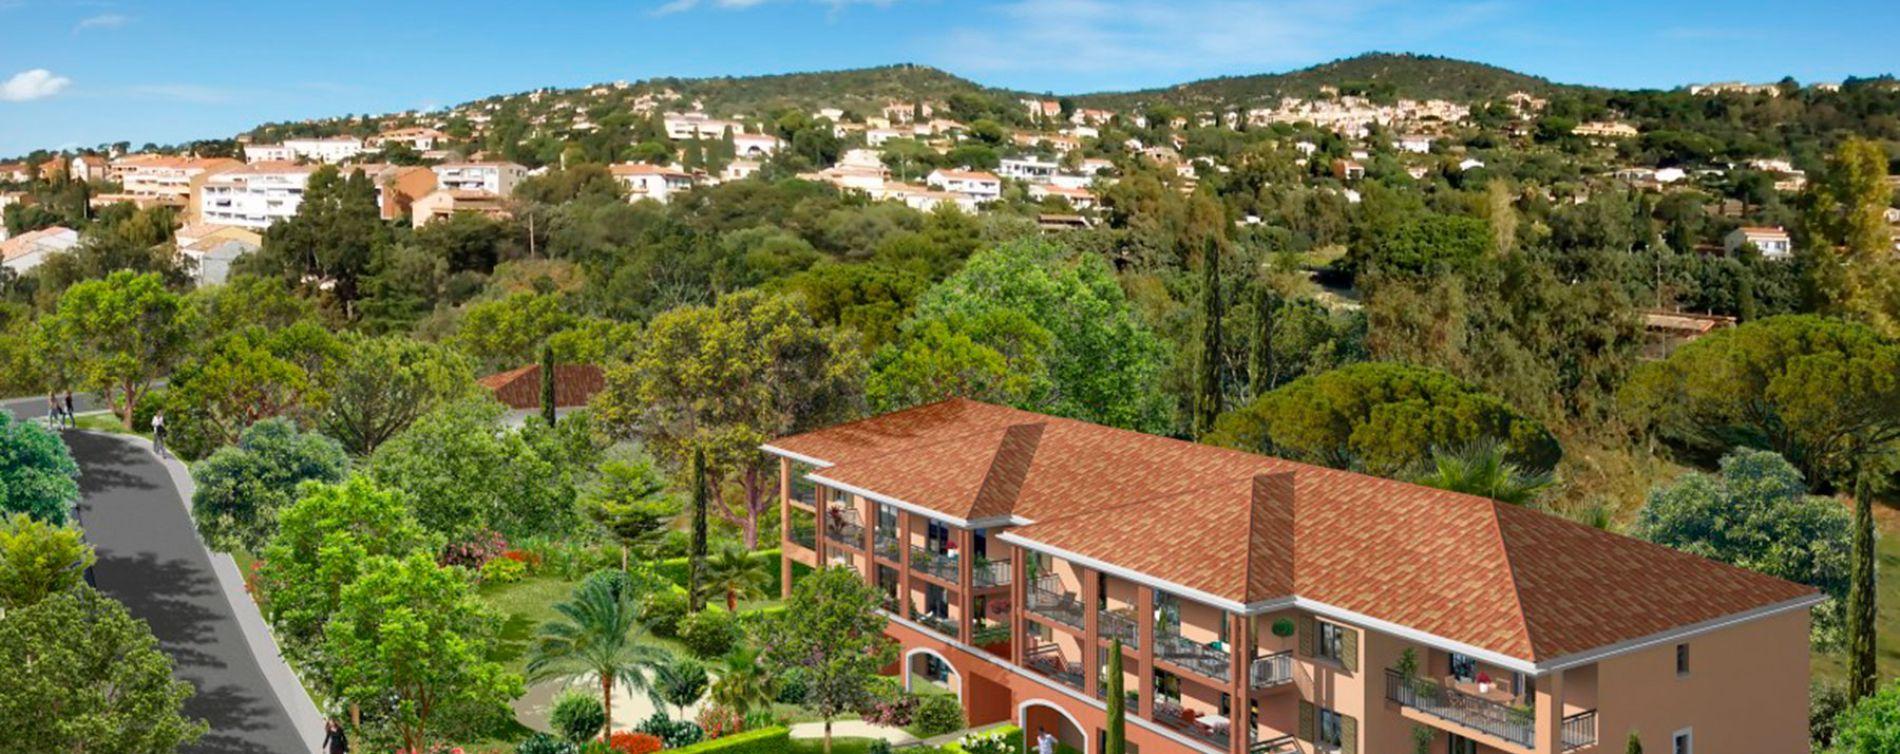 Bormes-les-Mimosas : programme immobilier neuve « Loderi » (3)